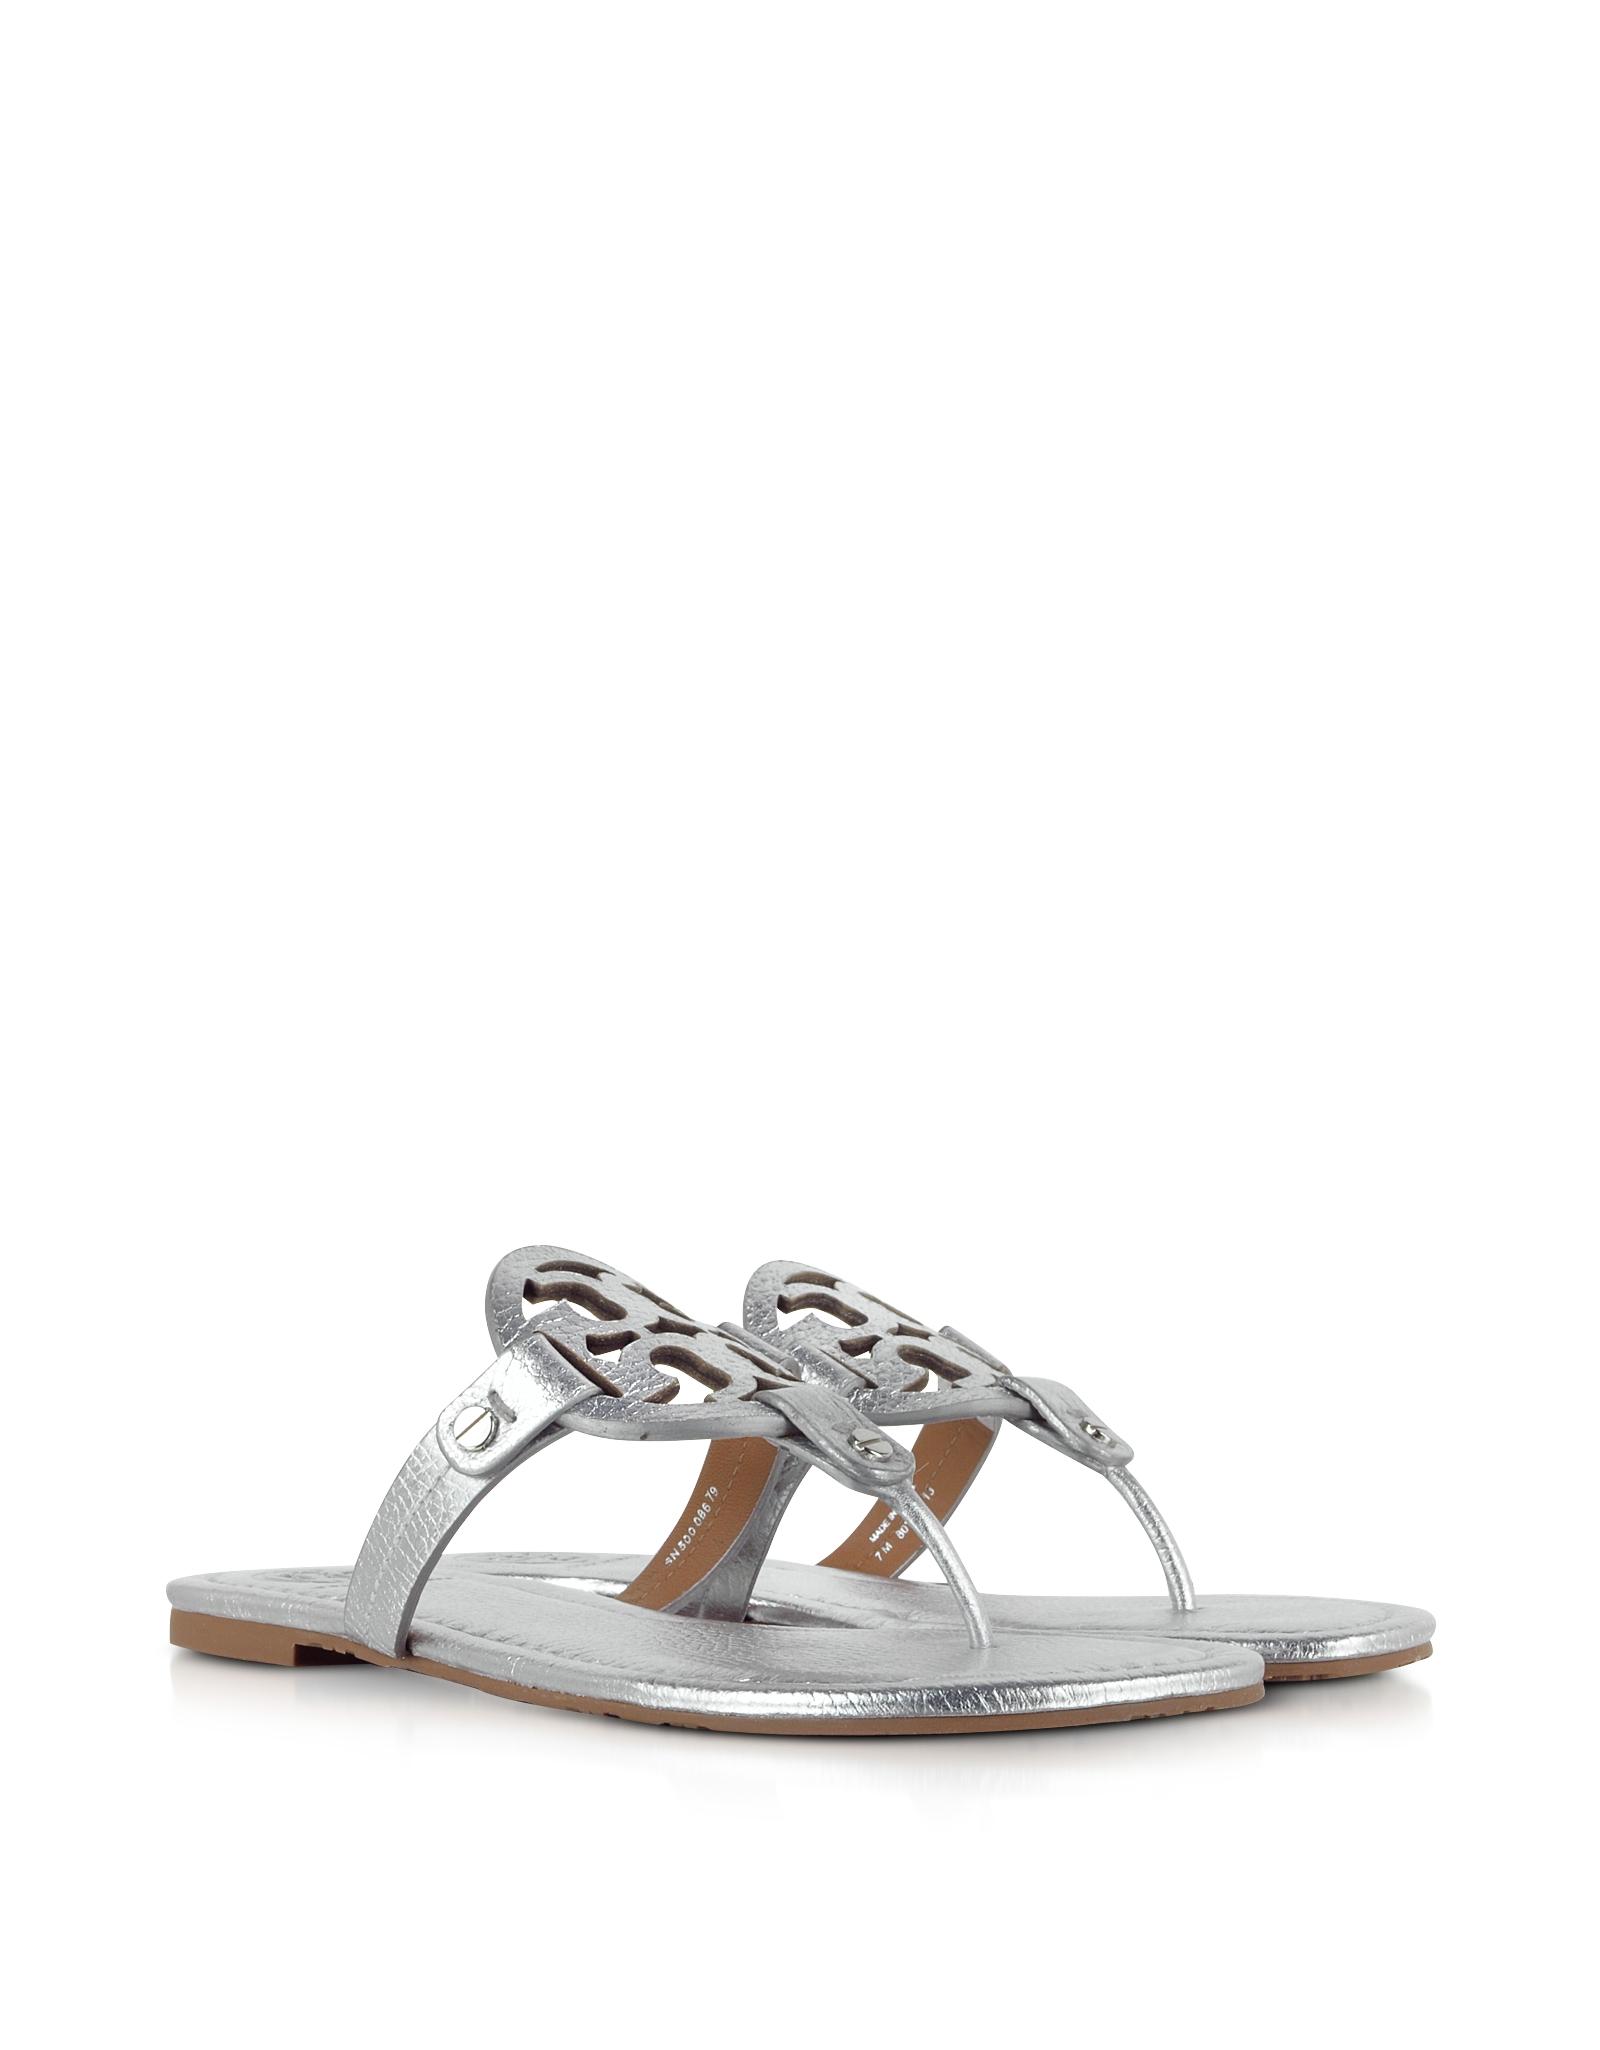 2715f9839 Lyst - Tory Burch Miller Metallic Silver Leather Sandal in Metallic